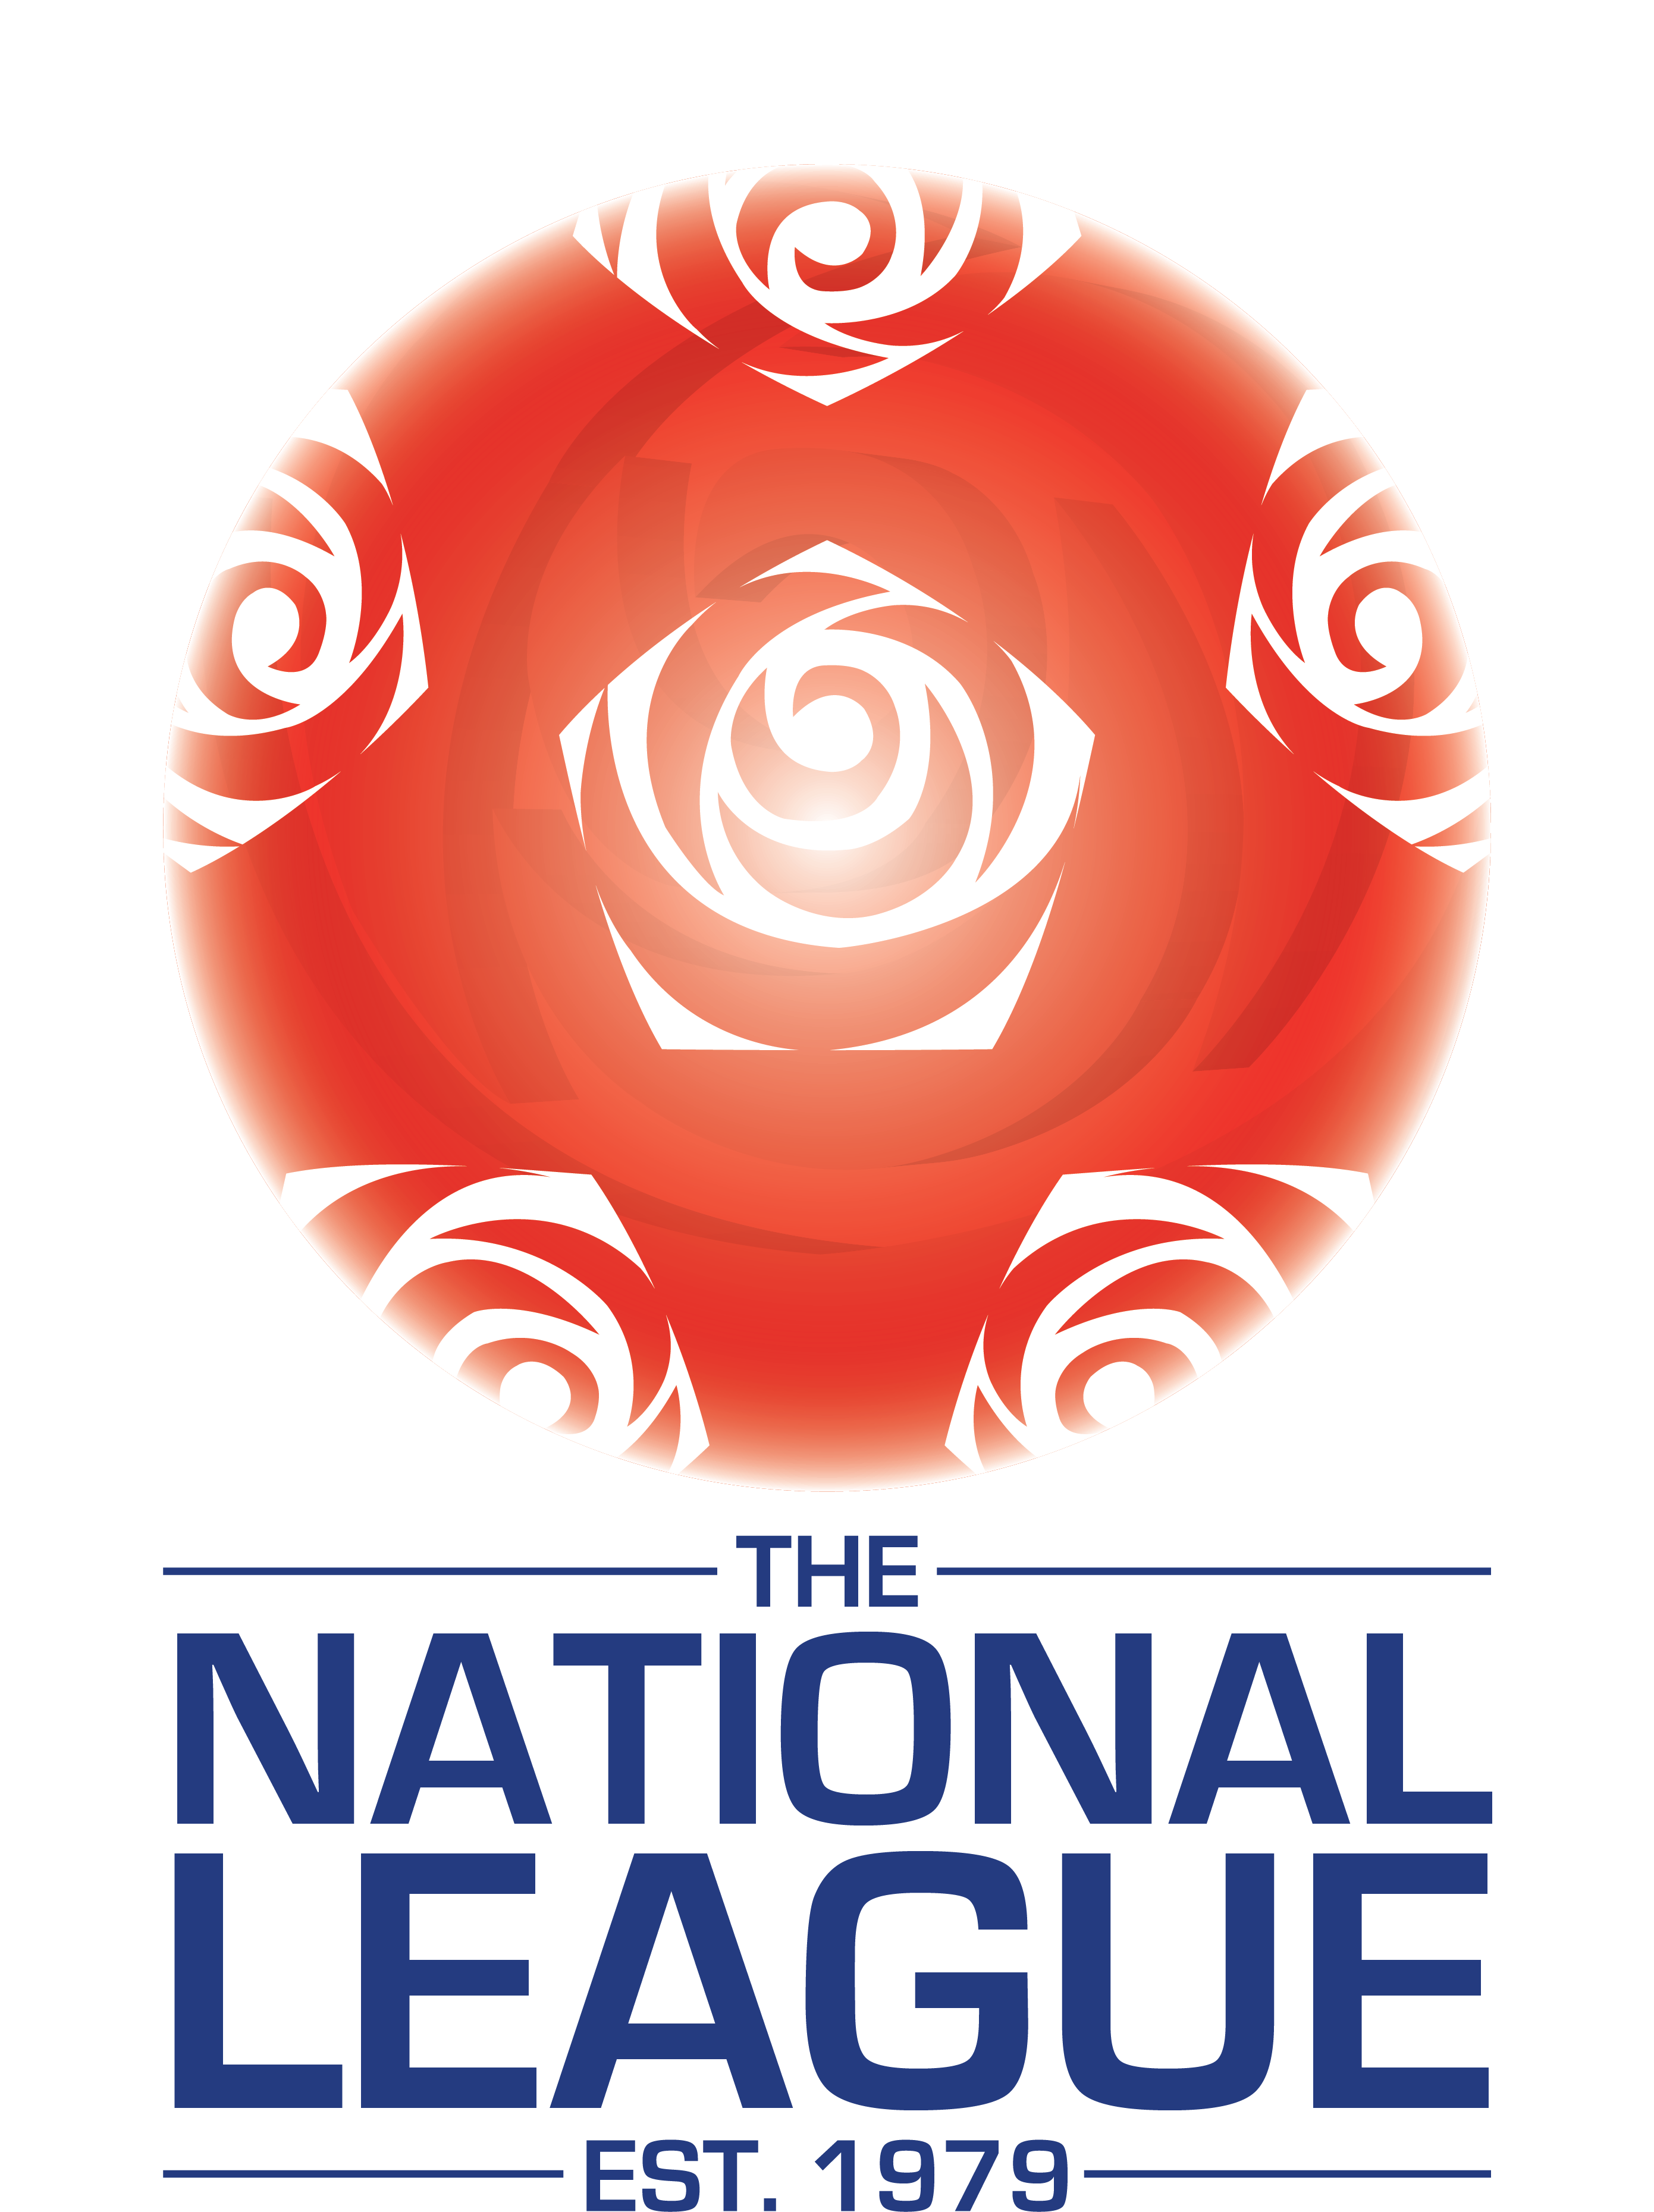 National League (English football)